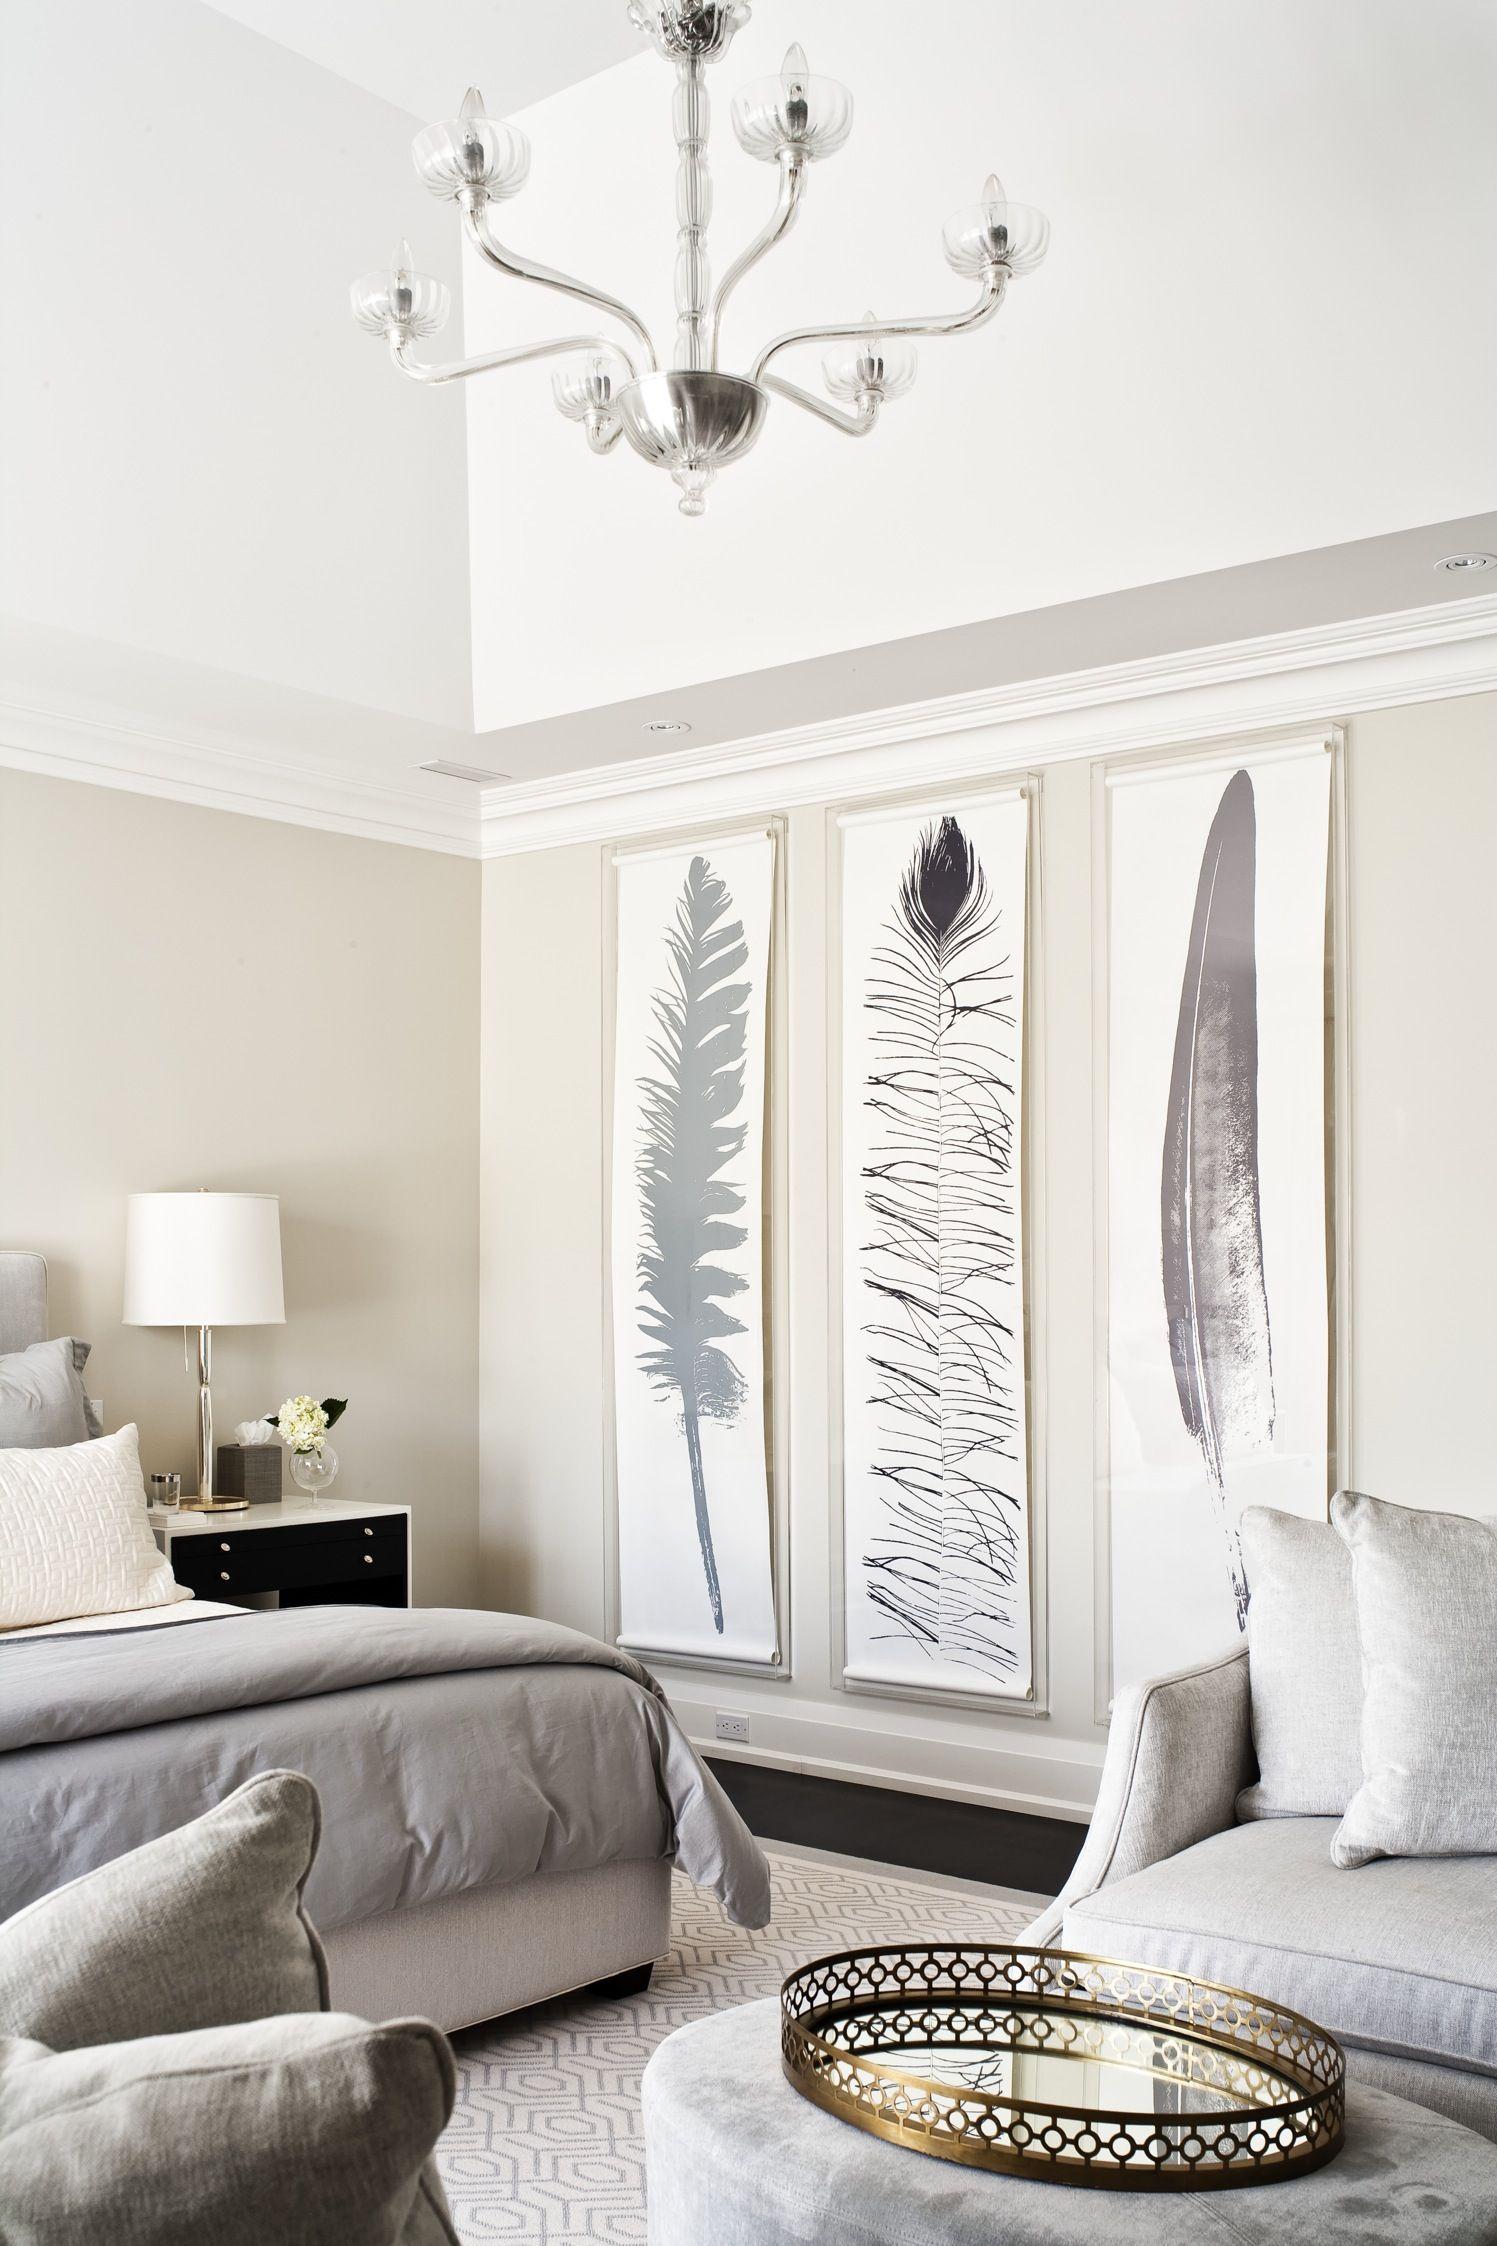 jennifer worts design inc. portfolio  Wall decor bedroom, Large